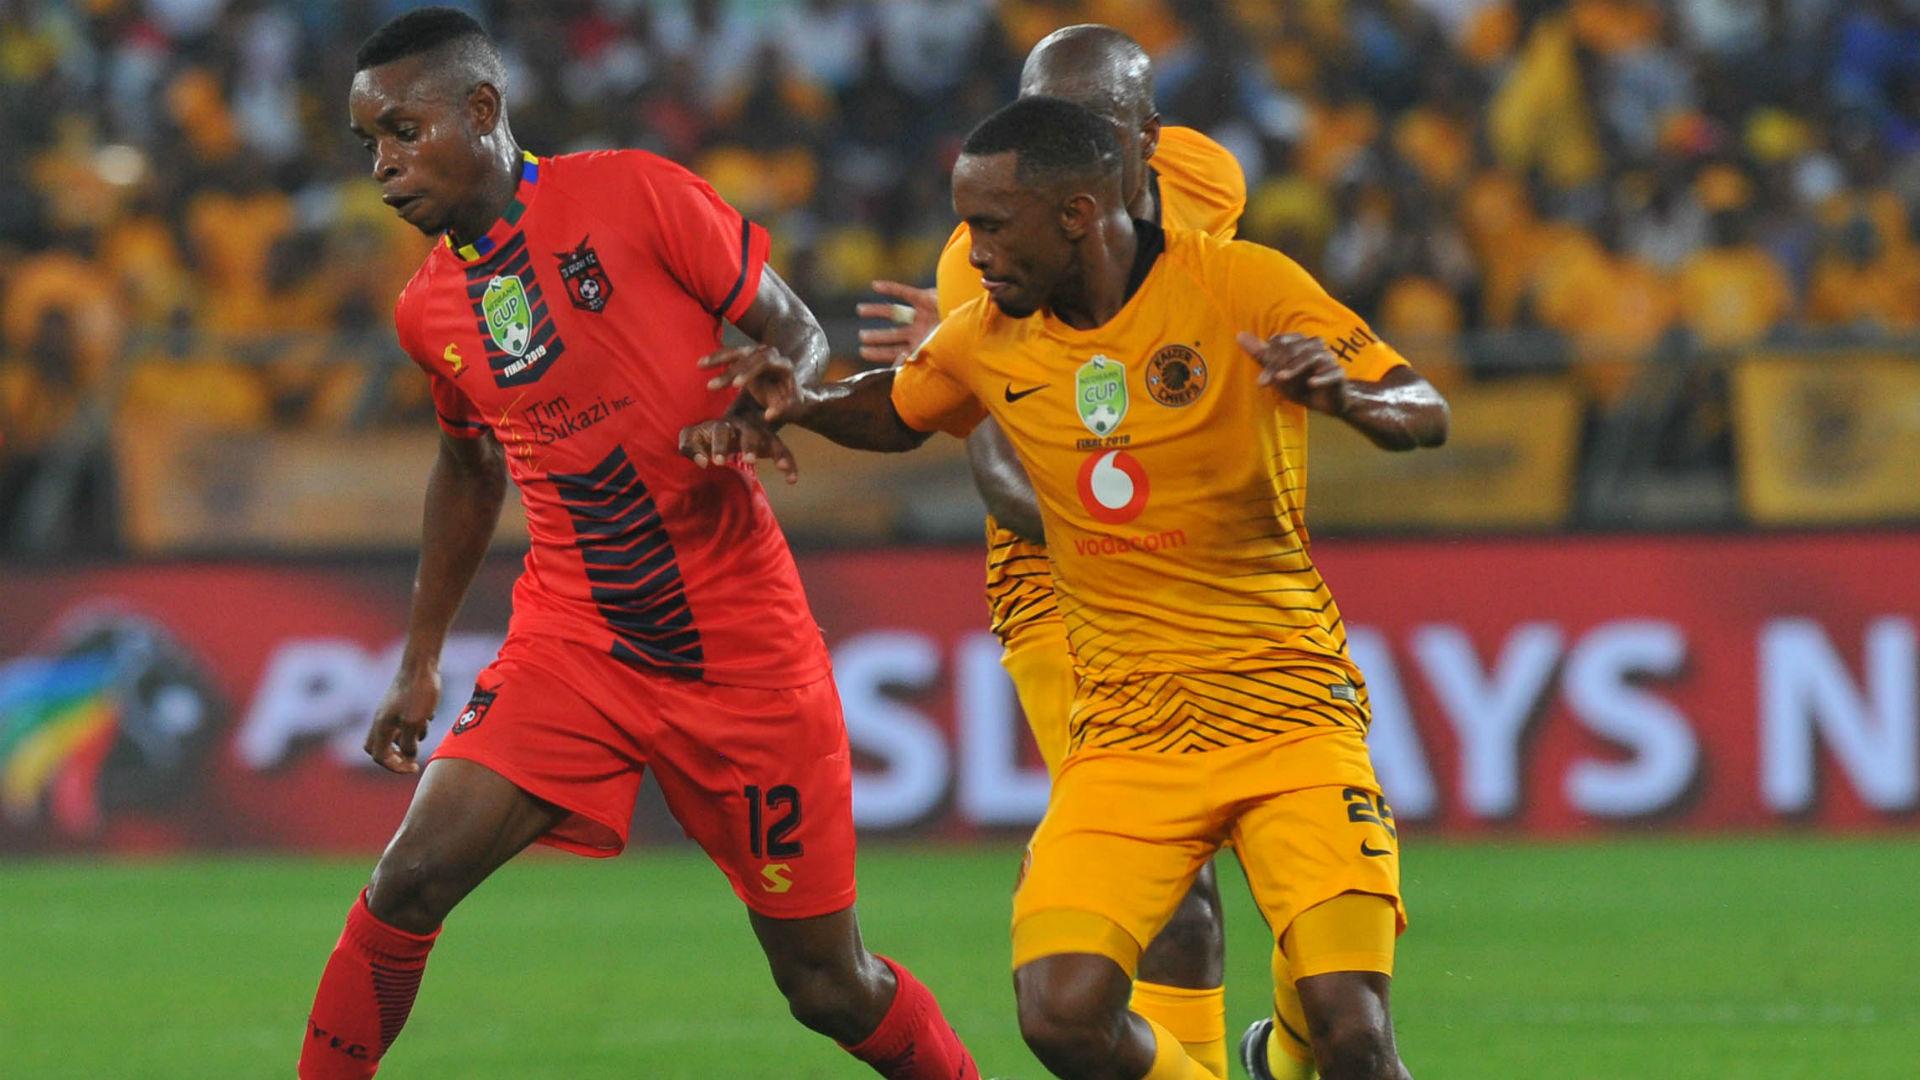 Nation Ndlovu of TS Galaxy challenged by Bernard Parker of Kaizer Chiefs, May 2019